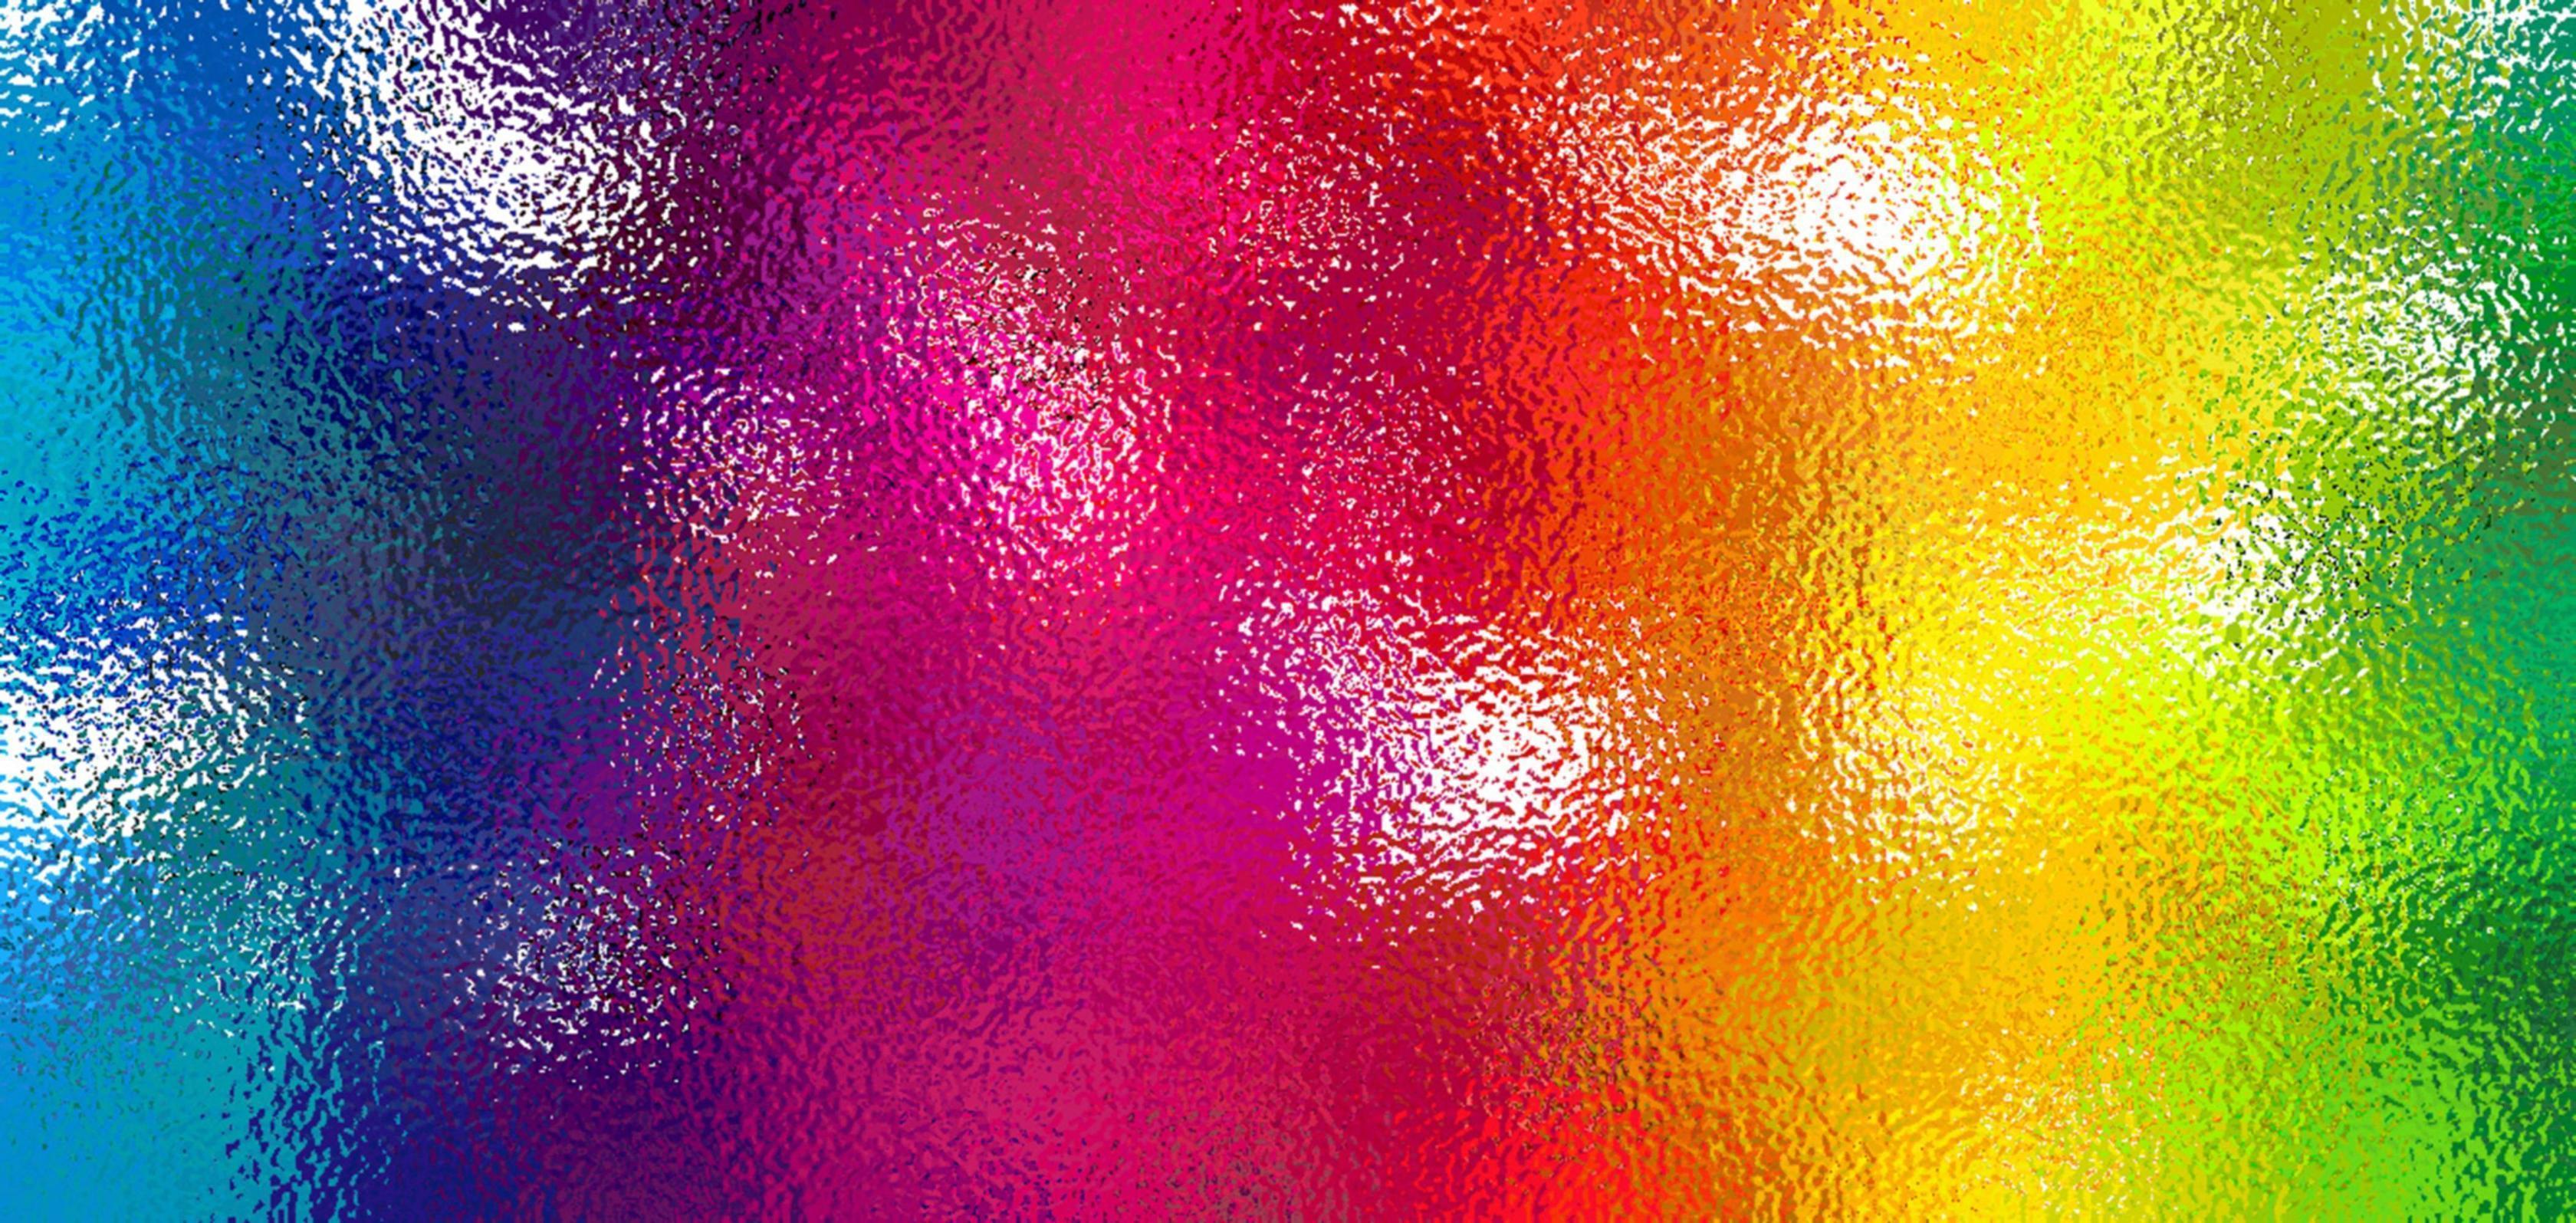 download colors hd wallpaper - photo #12